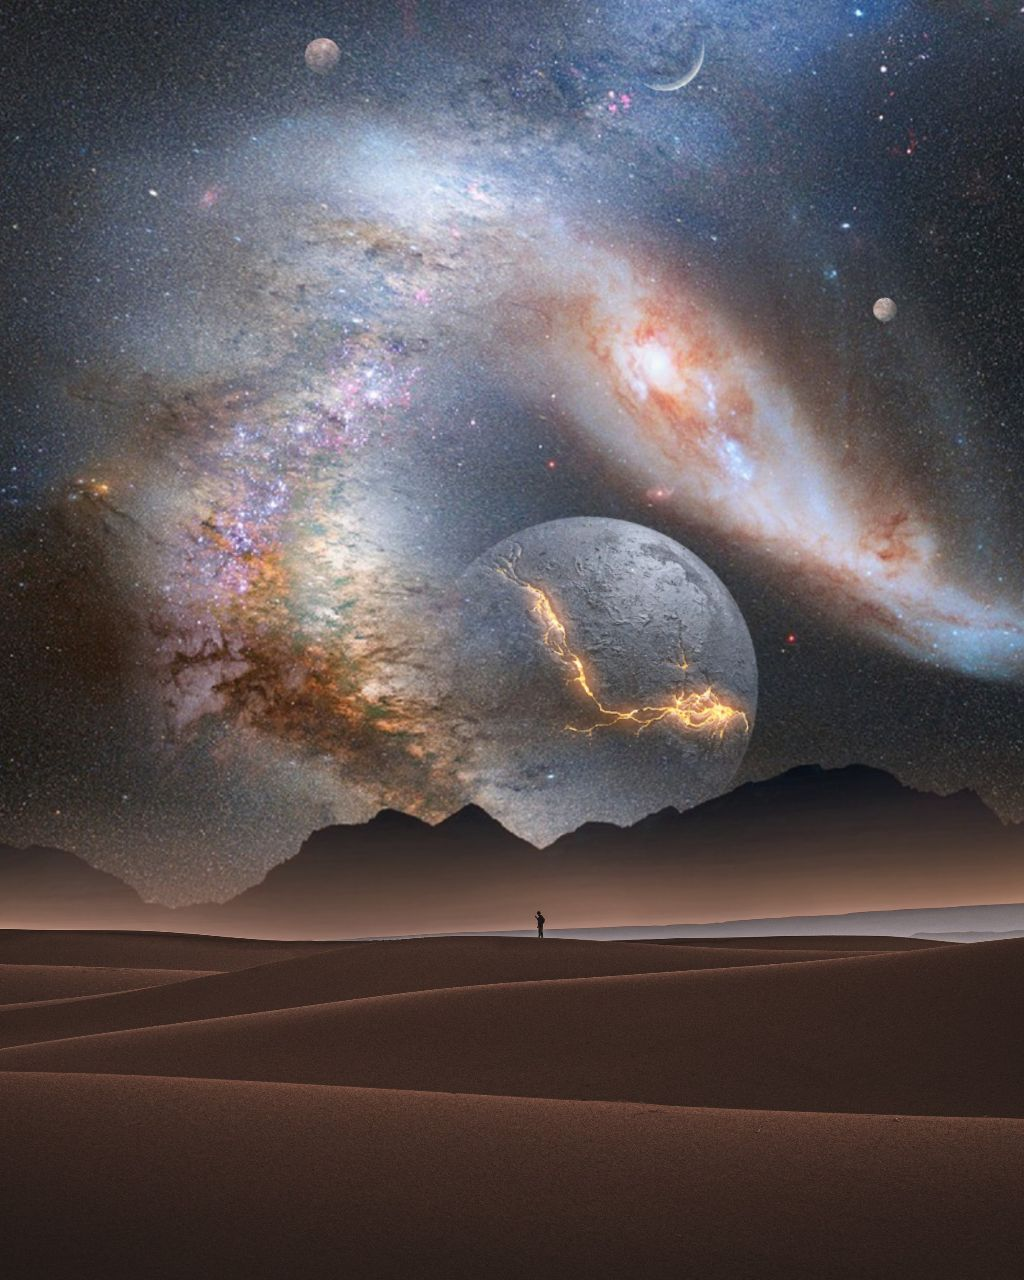 #freetoedit #background #galaxy #star#stars #planet #plants #space #nature #remix #desert #creative #visual #surreal @freetoedit @picsart